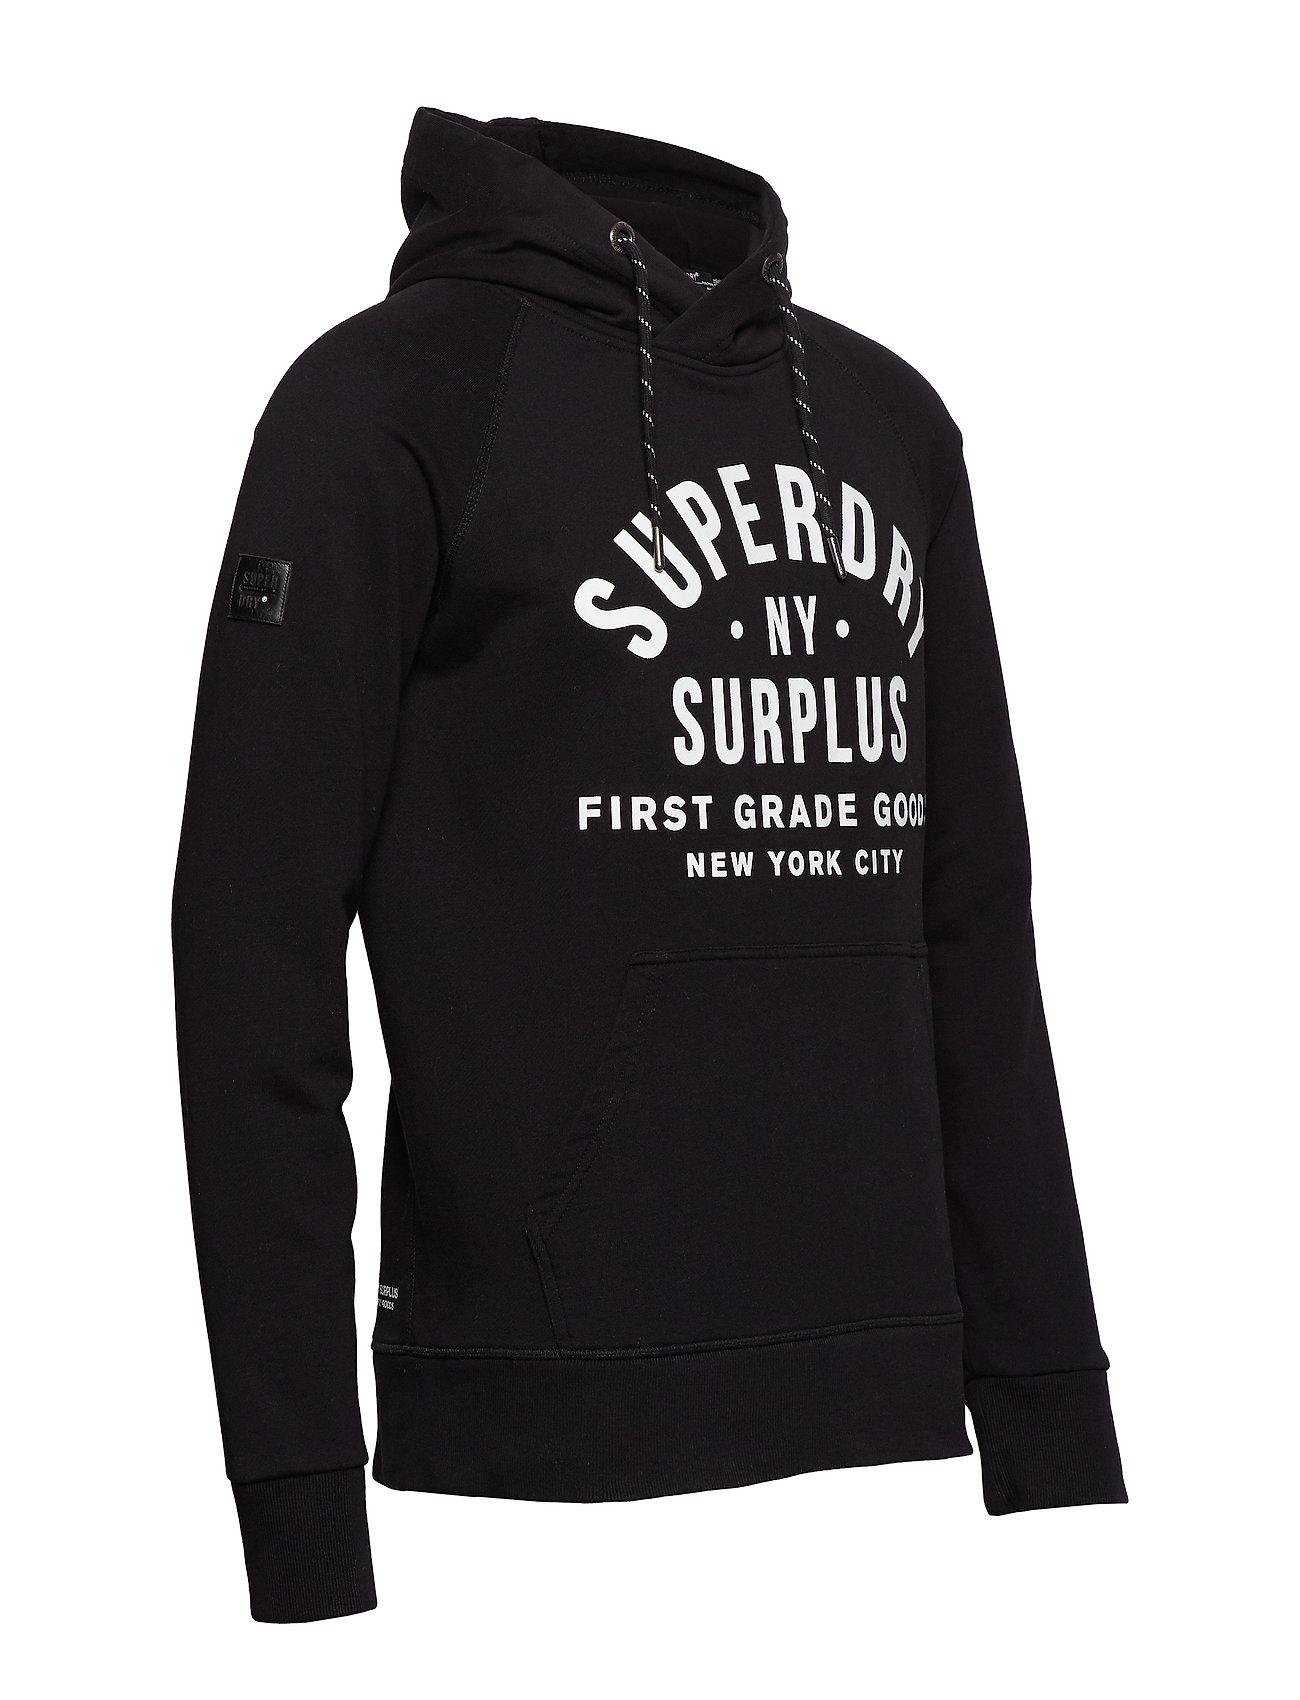 Goods Graphic Hoodjet Surplus Surplus BlackSuperdry dQeBrxCoW